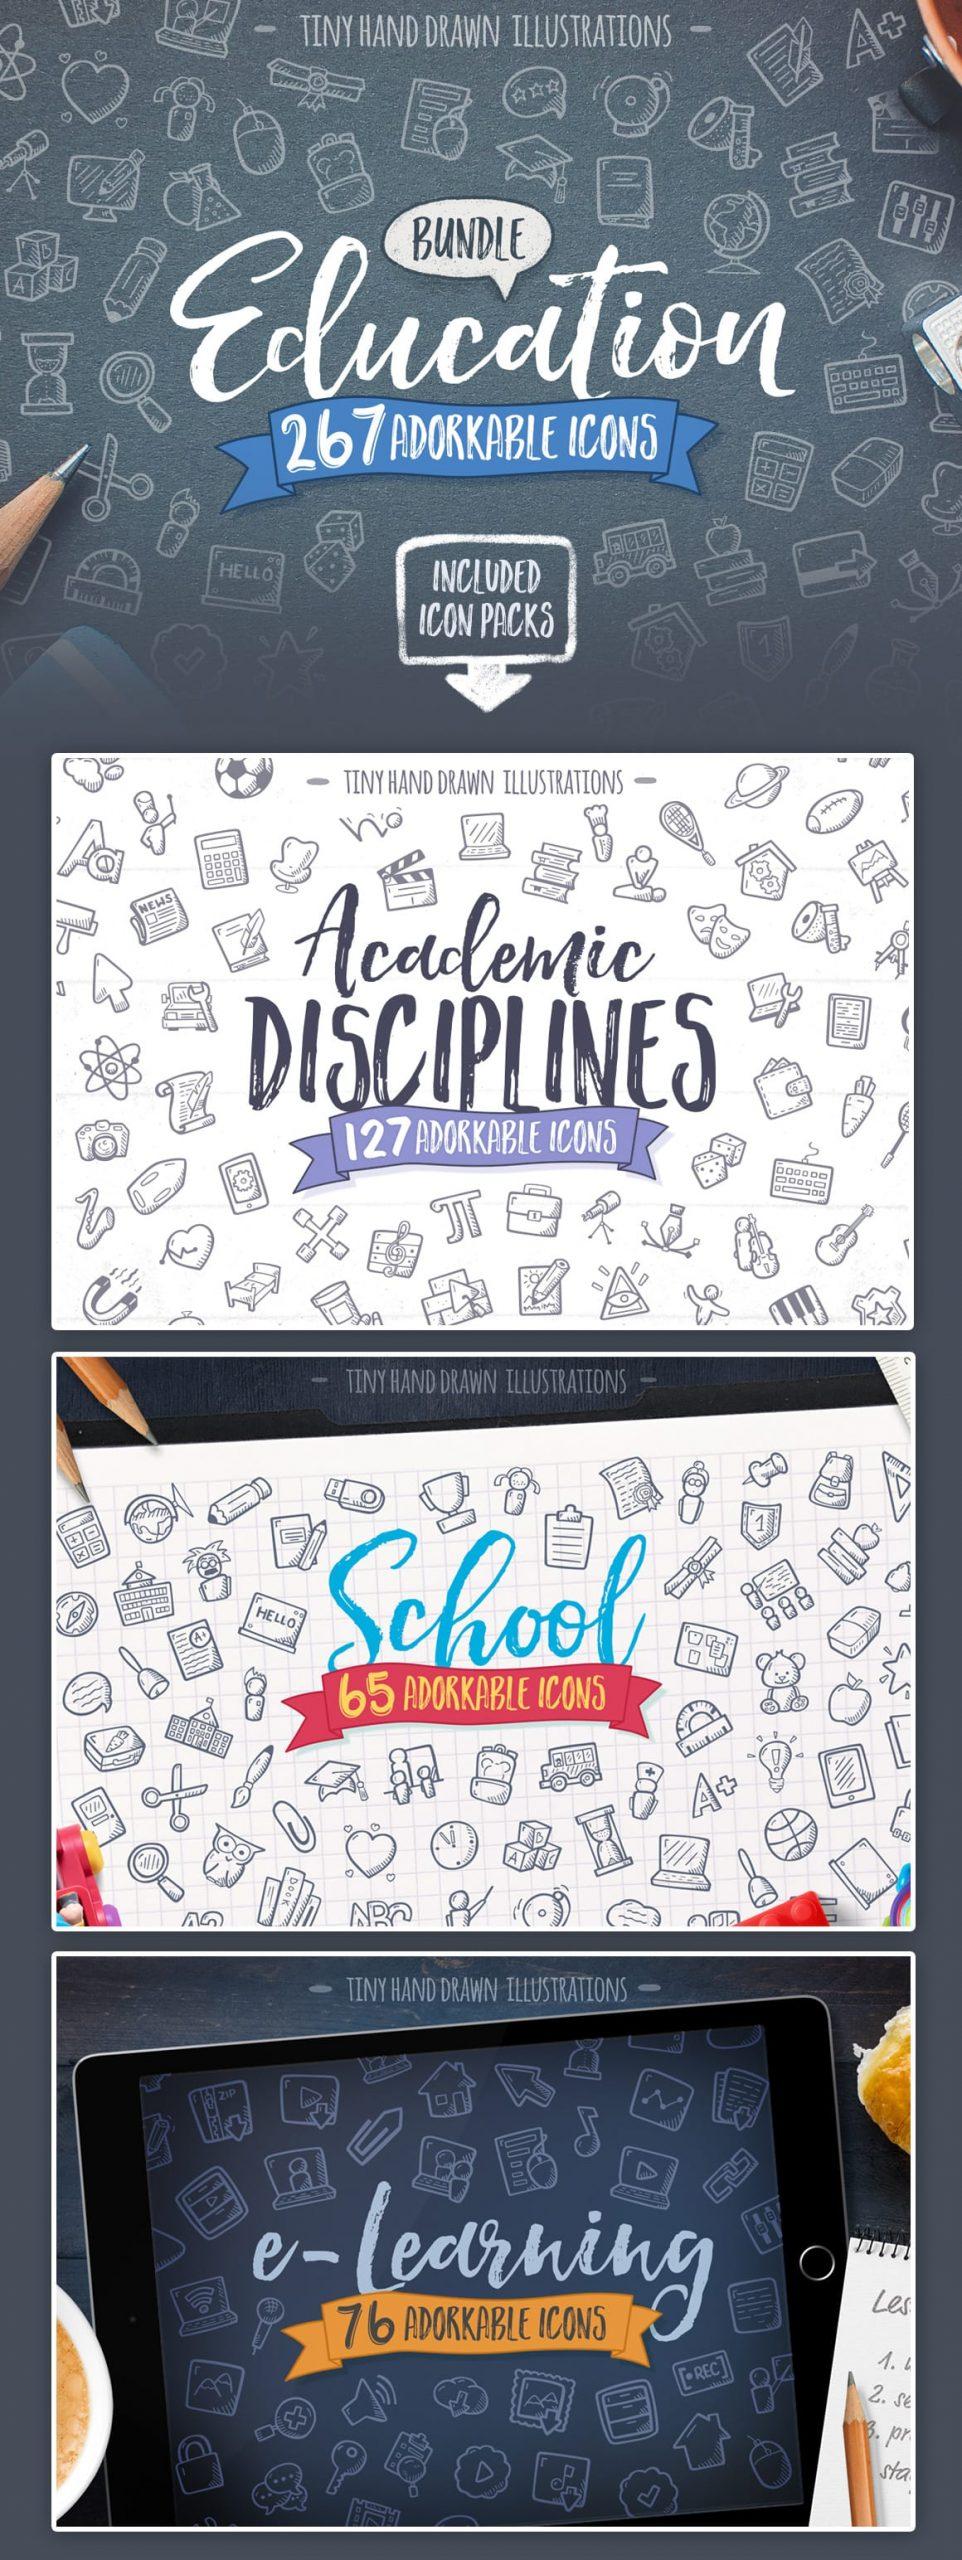 Hand Drawn Education Icons Bundle-School-Academic-E Learning